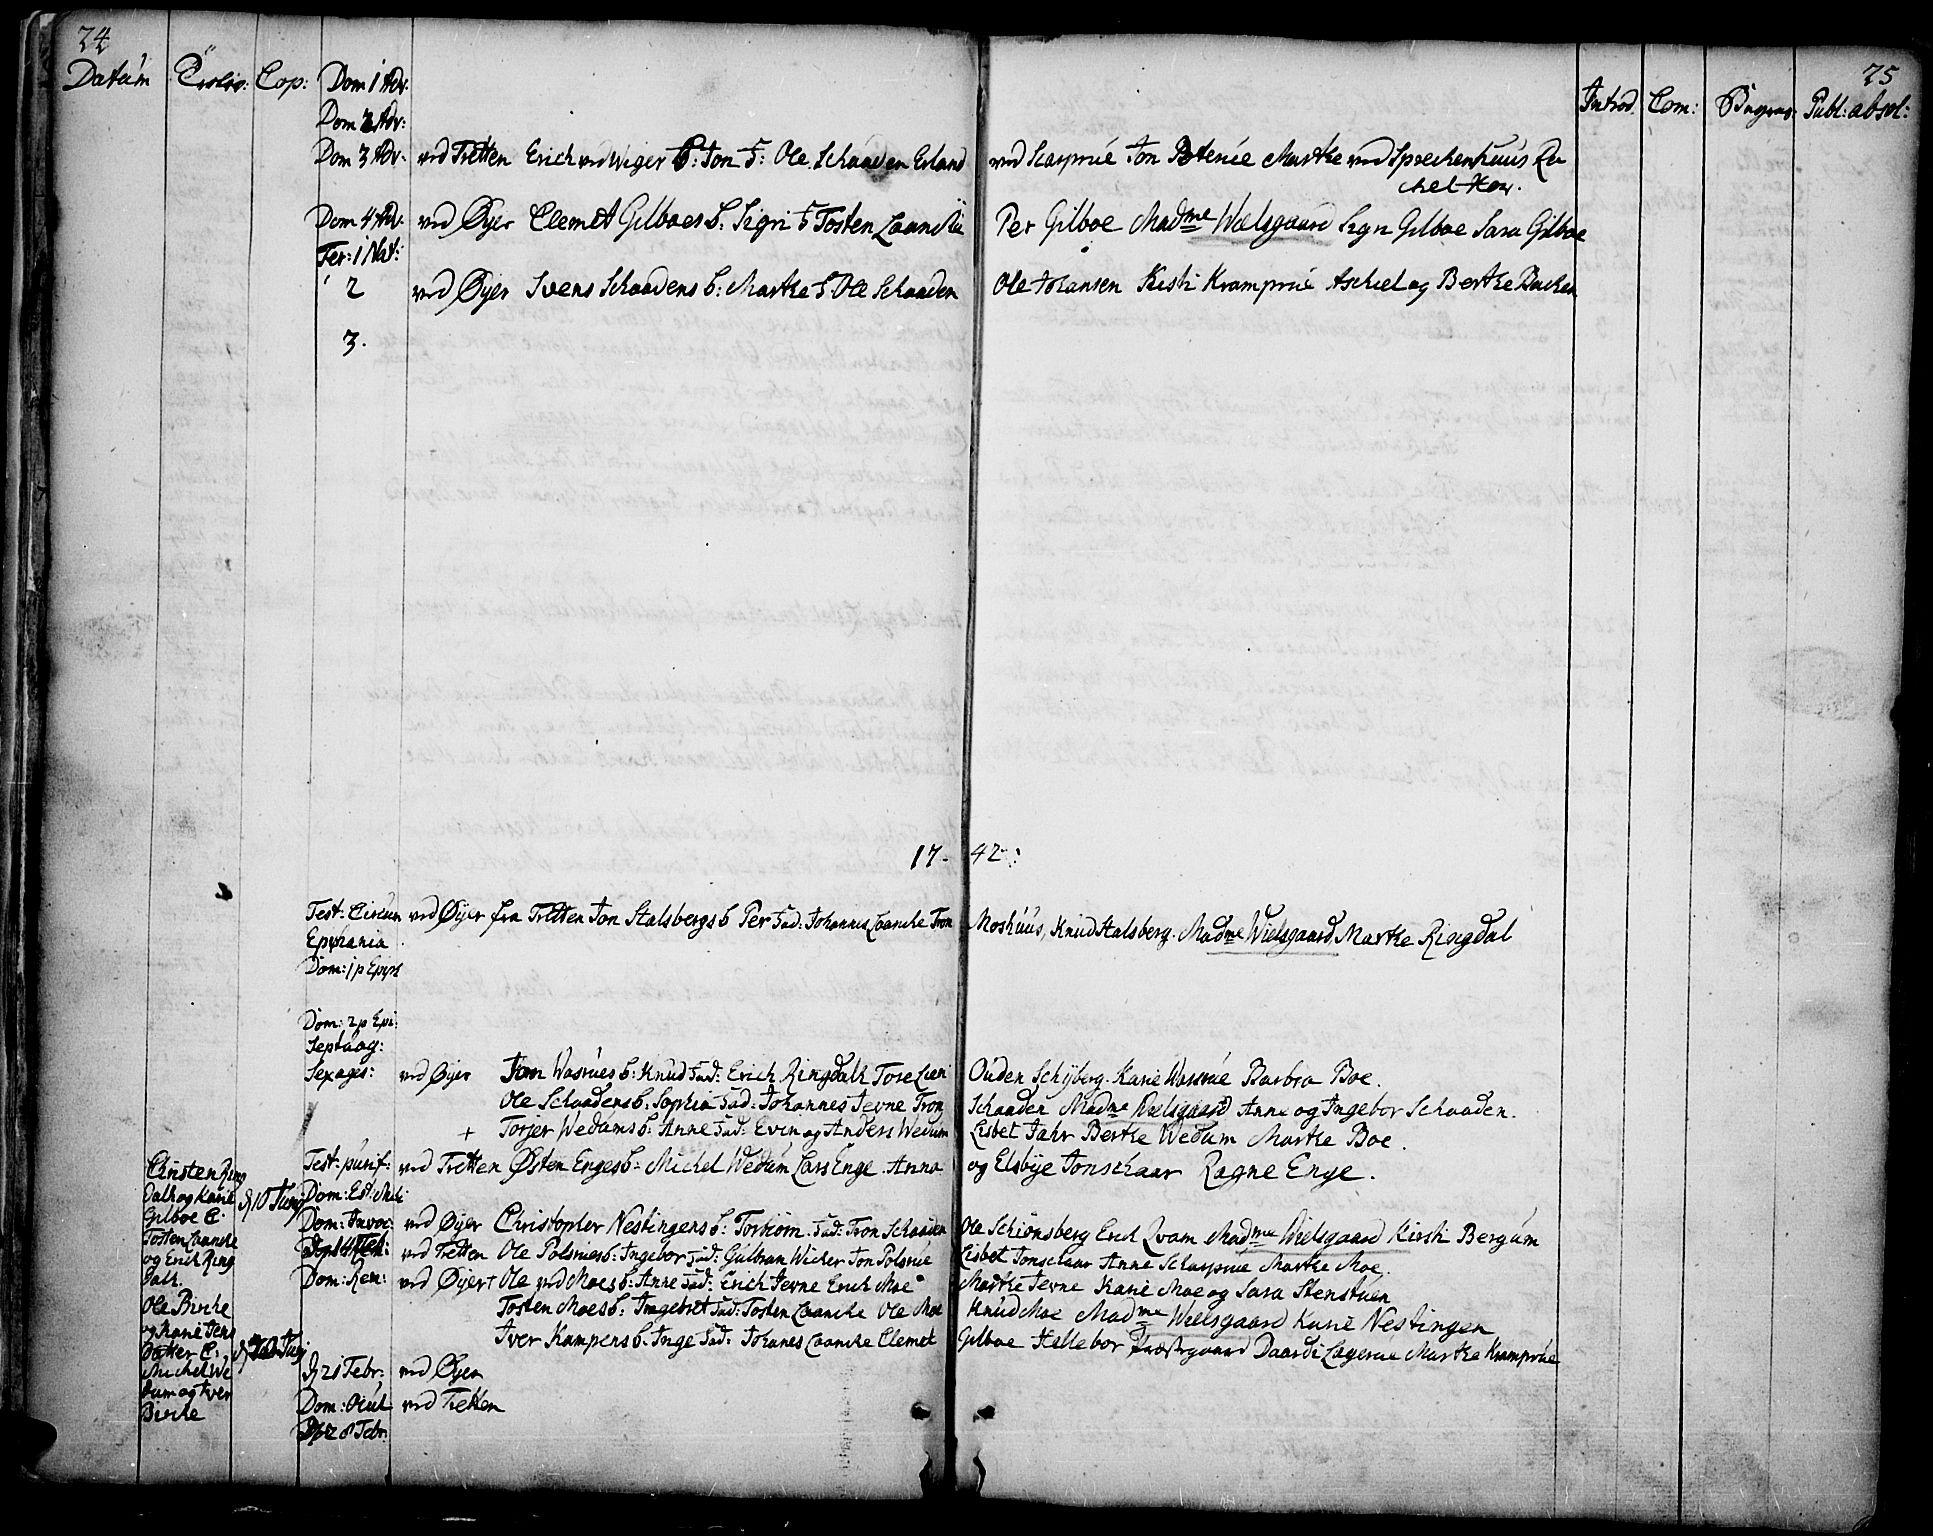 SAH, Øyer prestekontor, Ministerialbok nr. 2, 1733-1784, s. 24-25